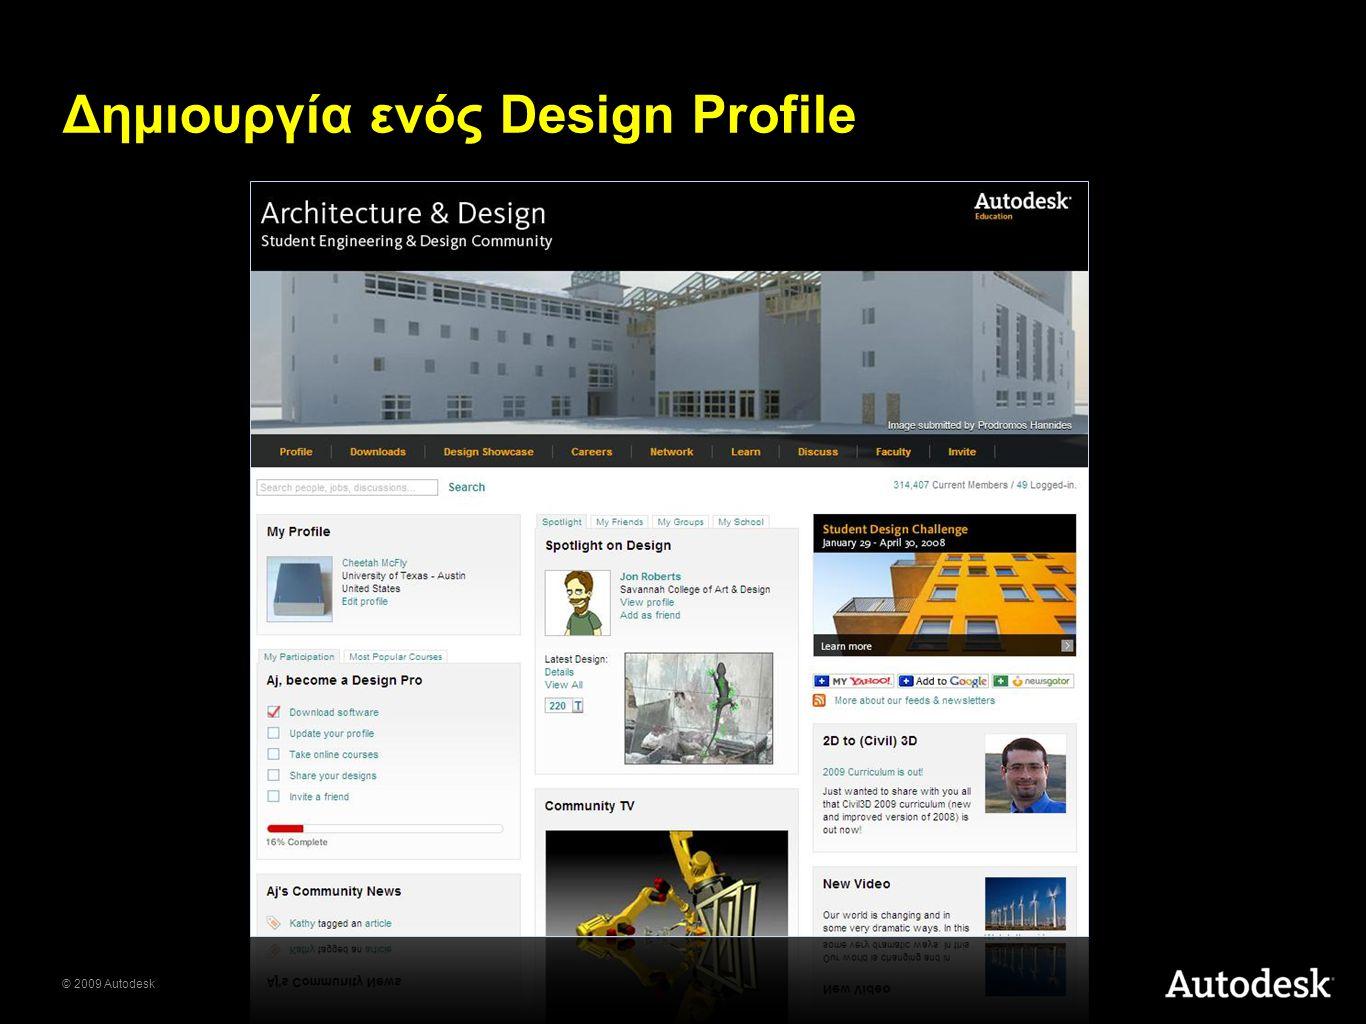 © 2009 Autodesk Καθηγητής προσκαλεί φοιτητές (συνέχεια) Βήμα 2a: Copy & paste αυτό το URL στη σελίδα σας, στο εσωτερικό website της Σχολής ή επιλέξτε e-mail to students.